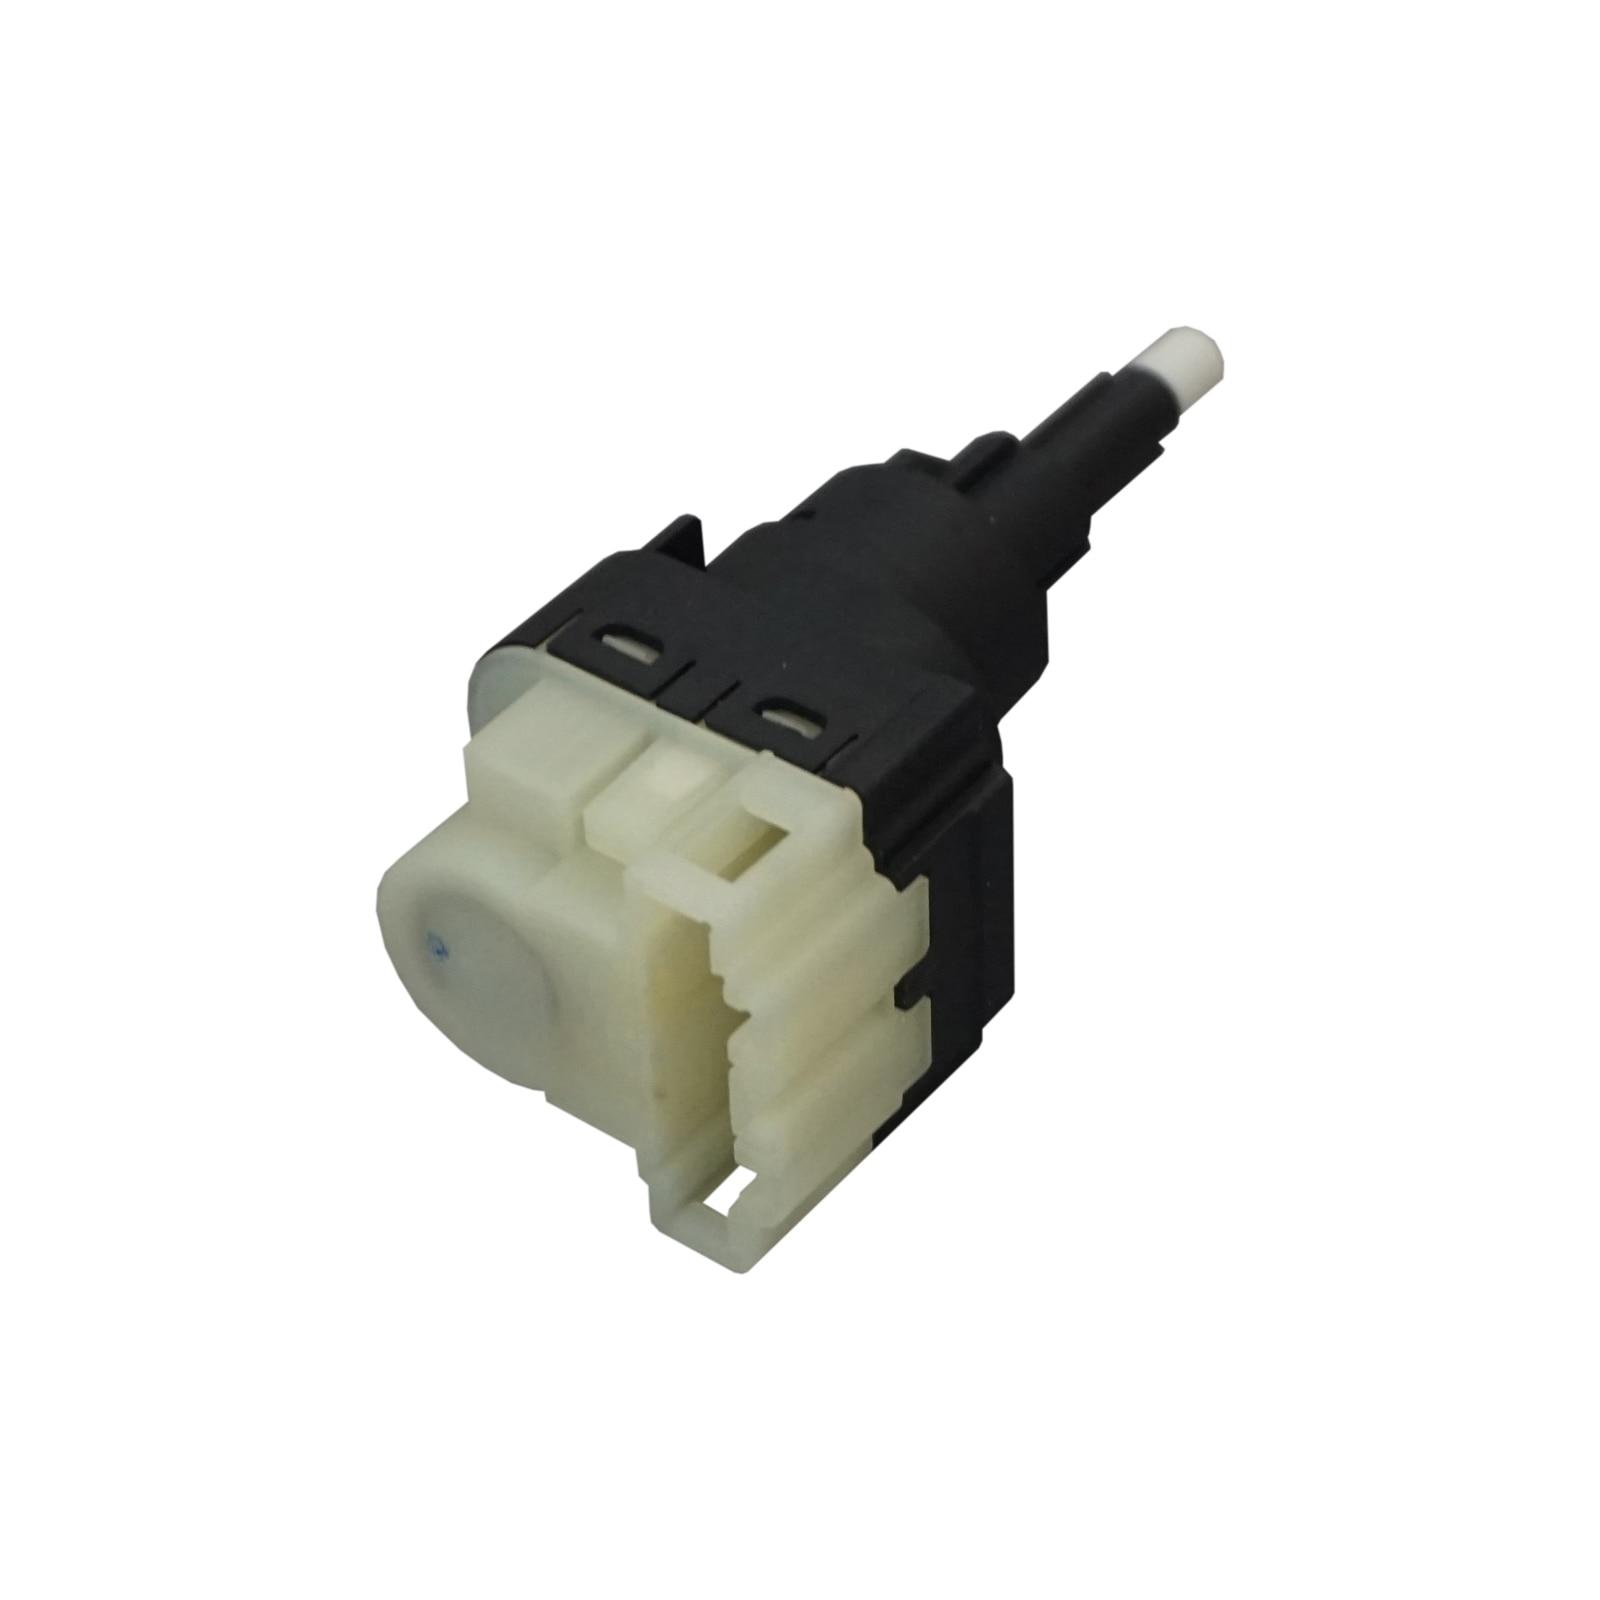 Interruptor negro de Pedal de luz de freno Bross BDP614 1K2945511 para. V W Un u d que S k o d S e a t